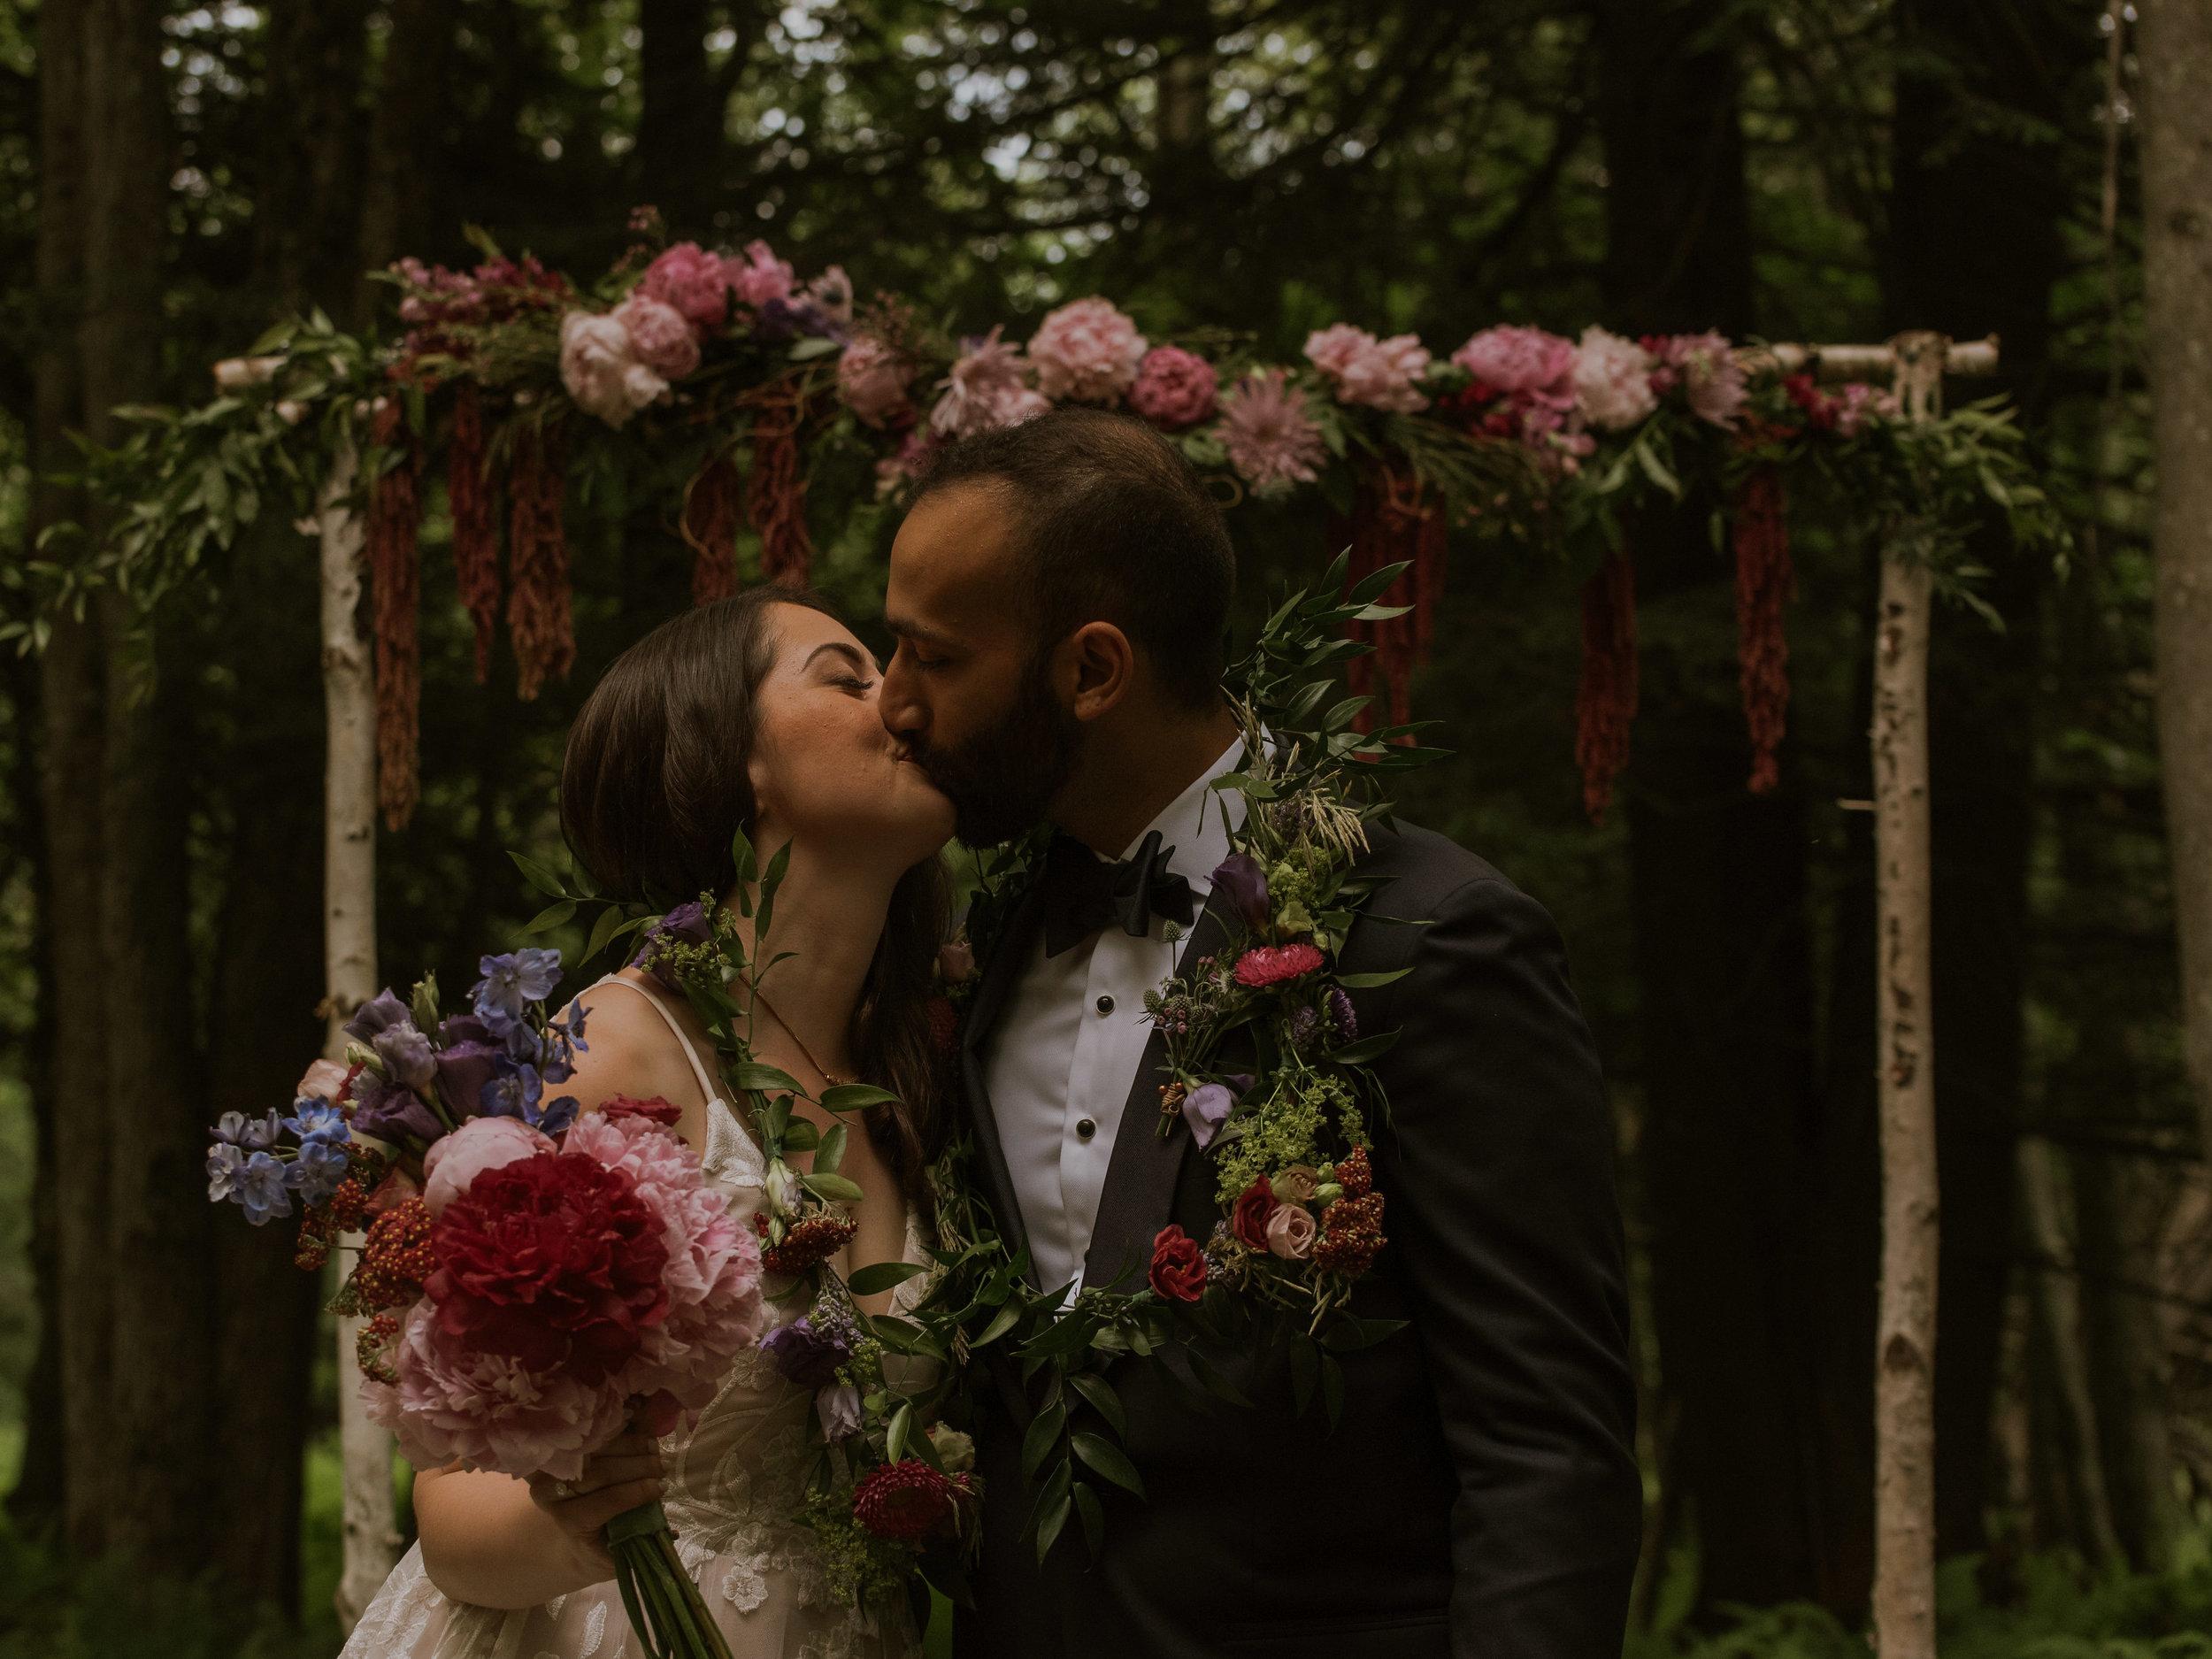 Cassandra-Anu-Wedding-Upstate-Catskills-Summer-Meadowlark-Stills-Lawrence-Braun-FINAL-0531.jpg